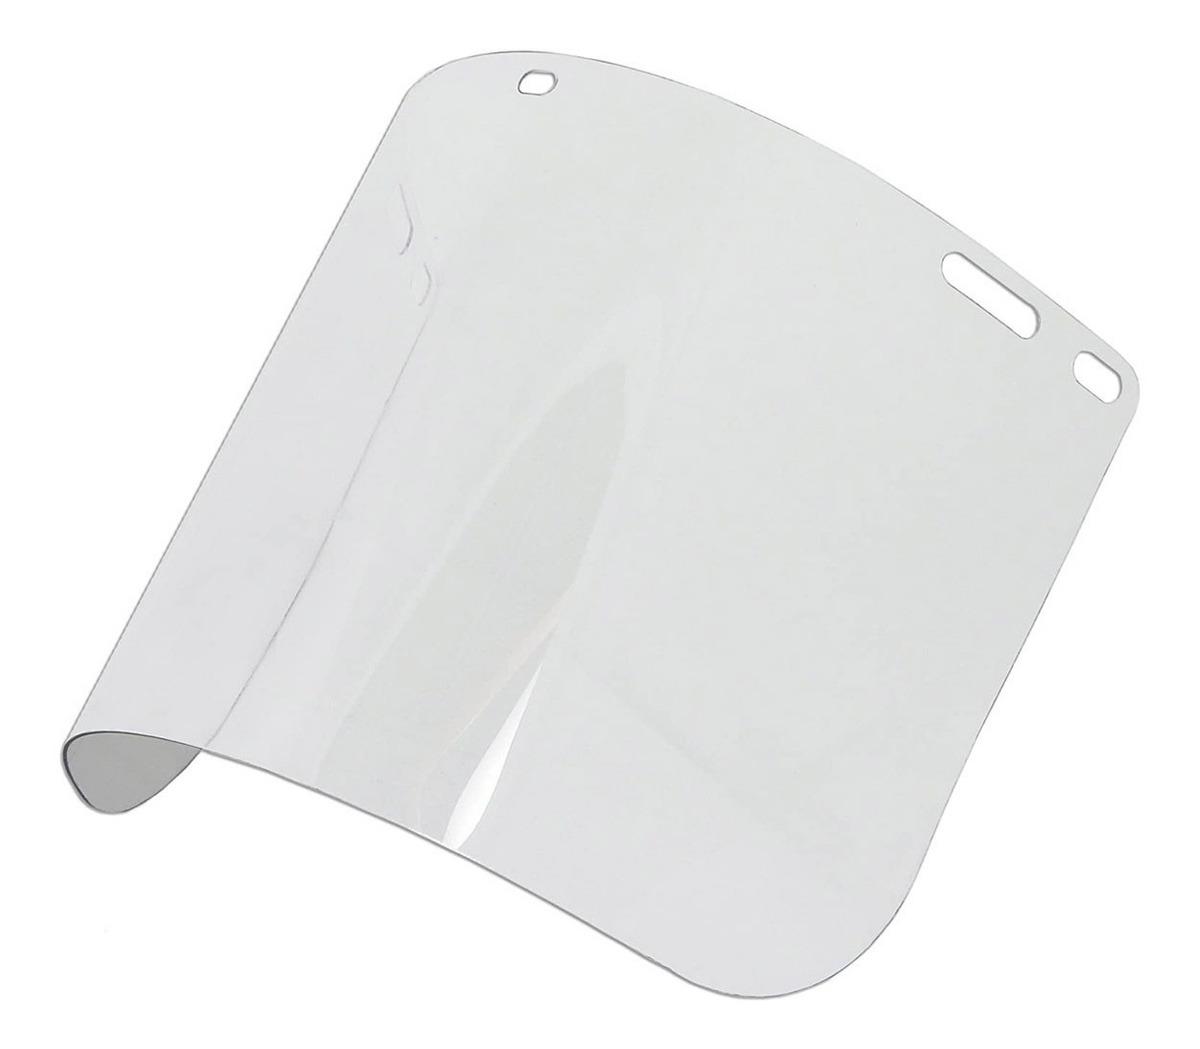 Protector Facial Repuesto Visor 3po-848t Infra